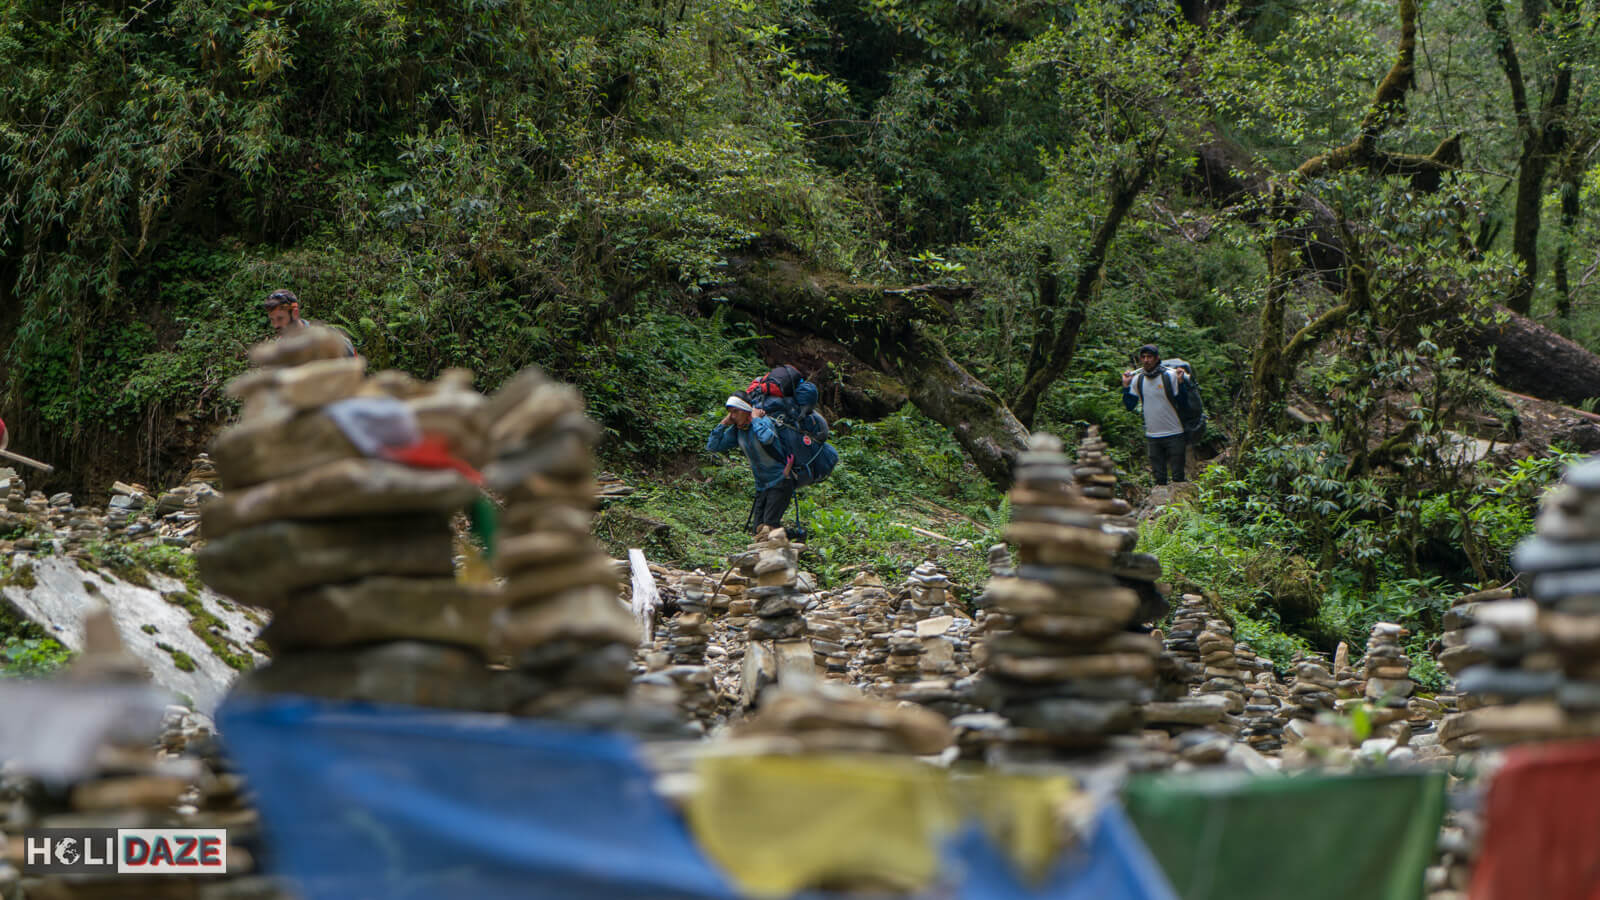 Sherpas are a must when trekking Annapurna in Nepal